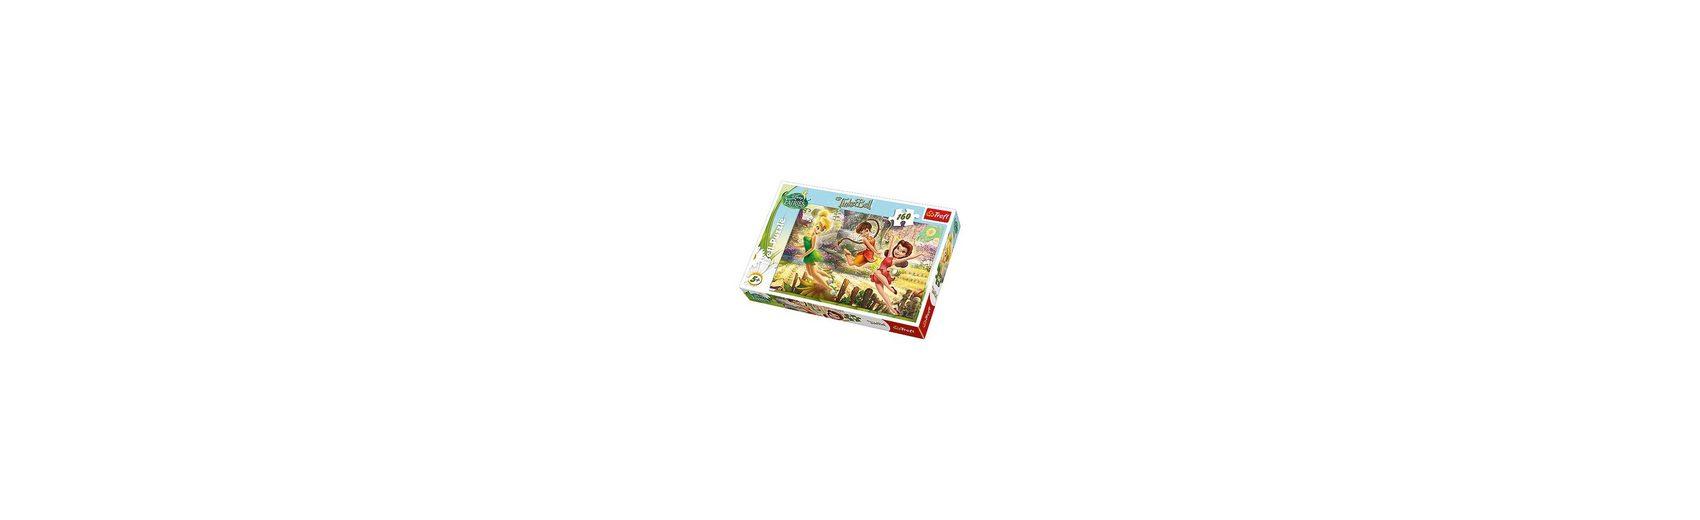 Trefl Puzzle 160 Teile - Disney Fairies